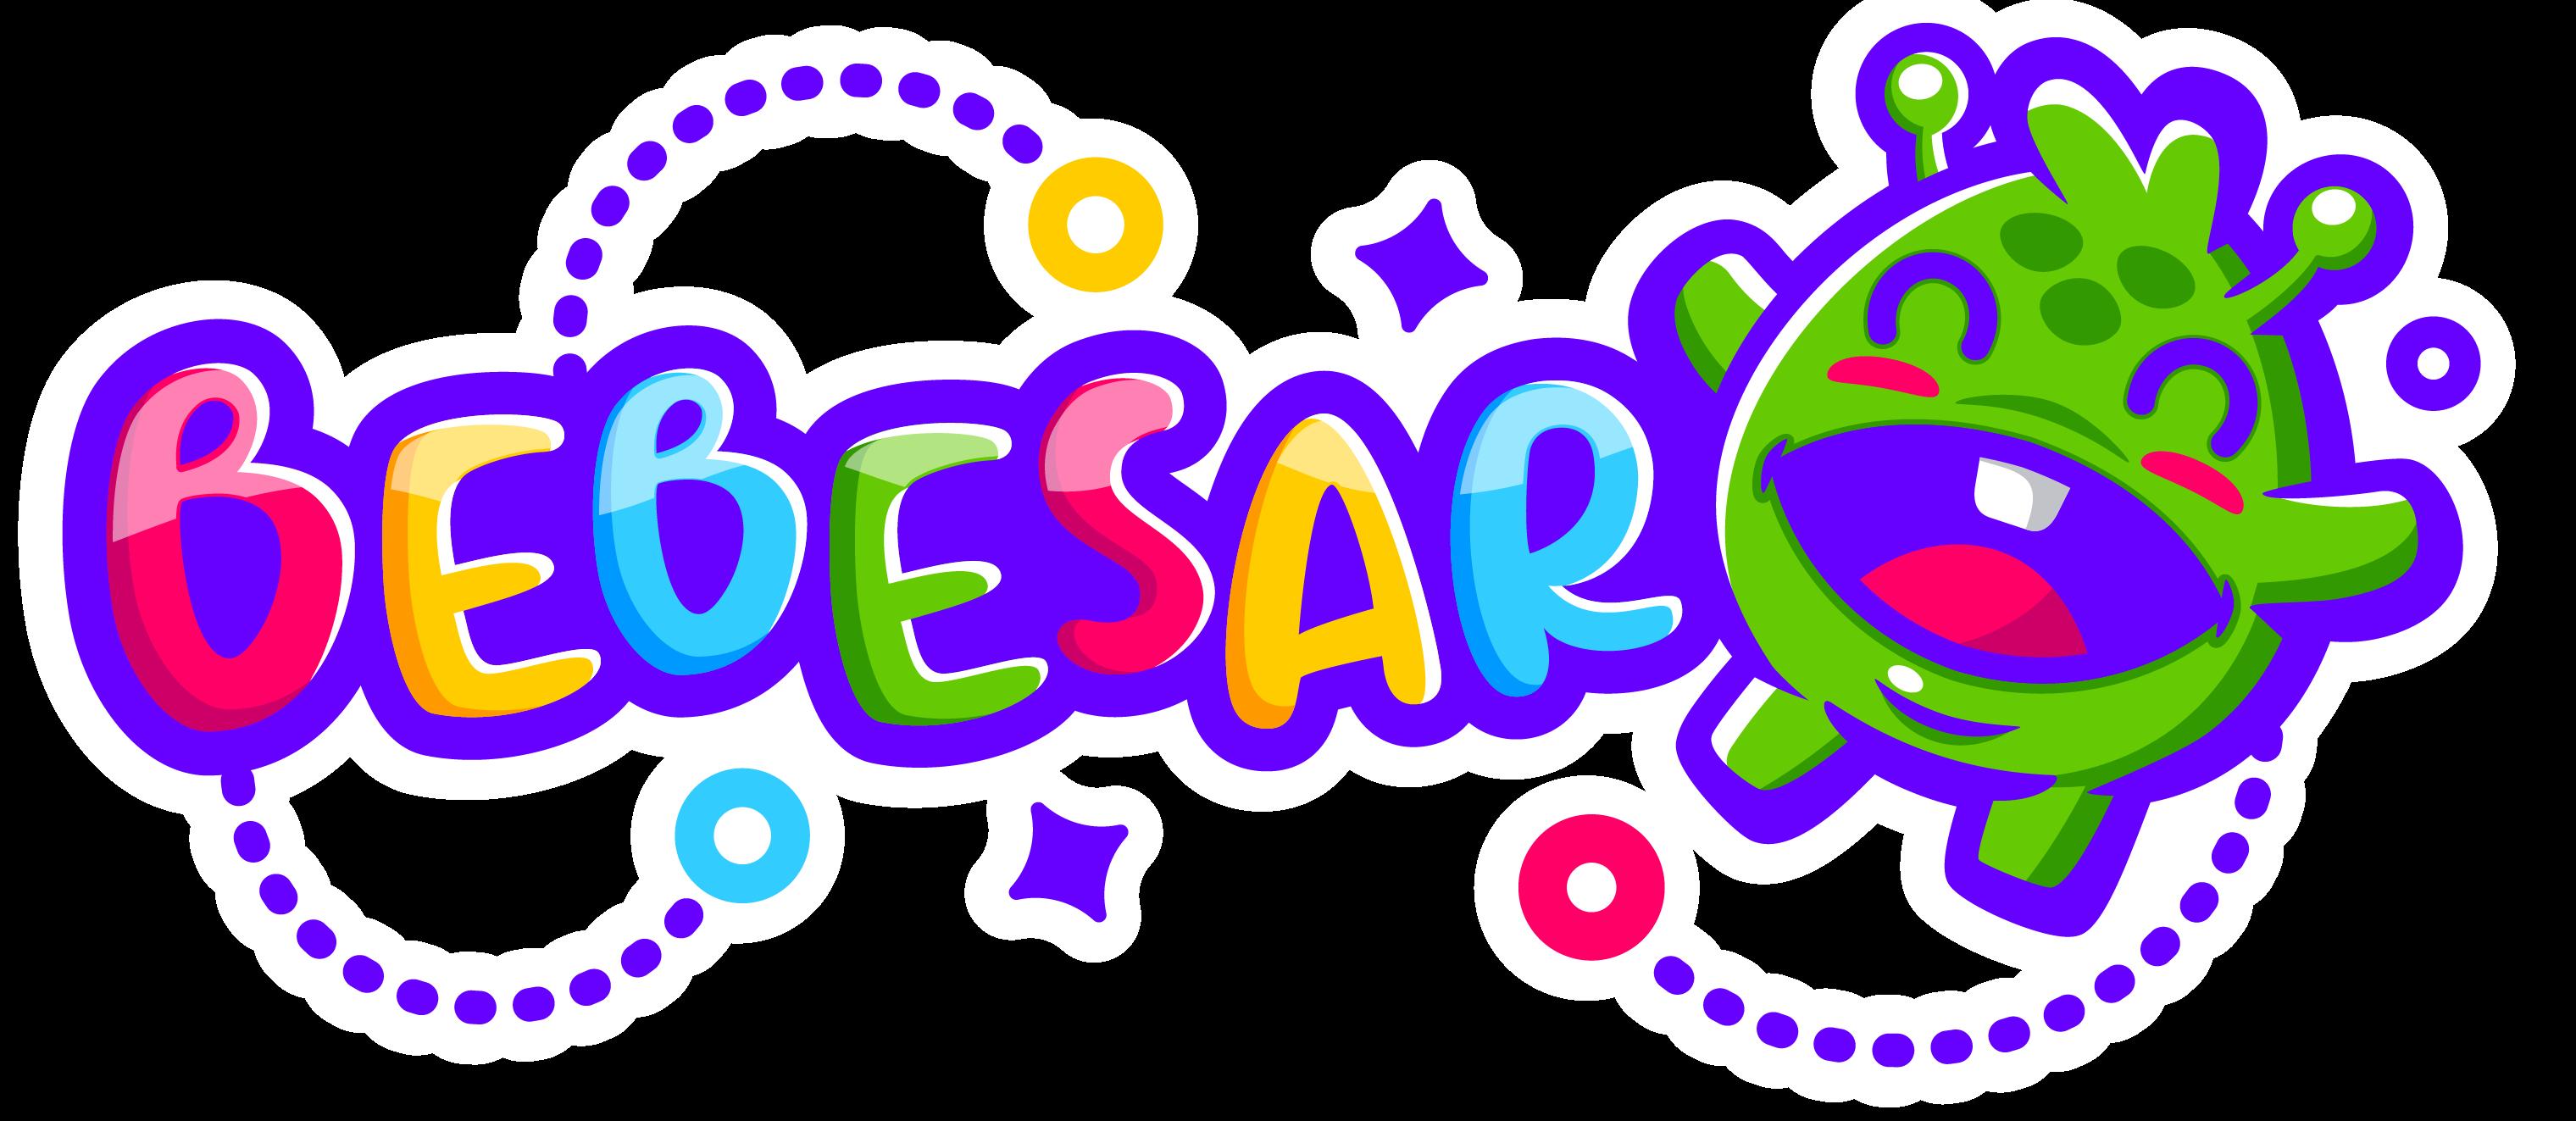 Bebesar.com